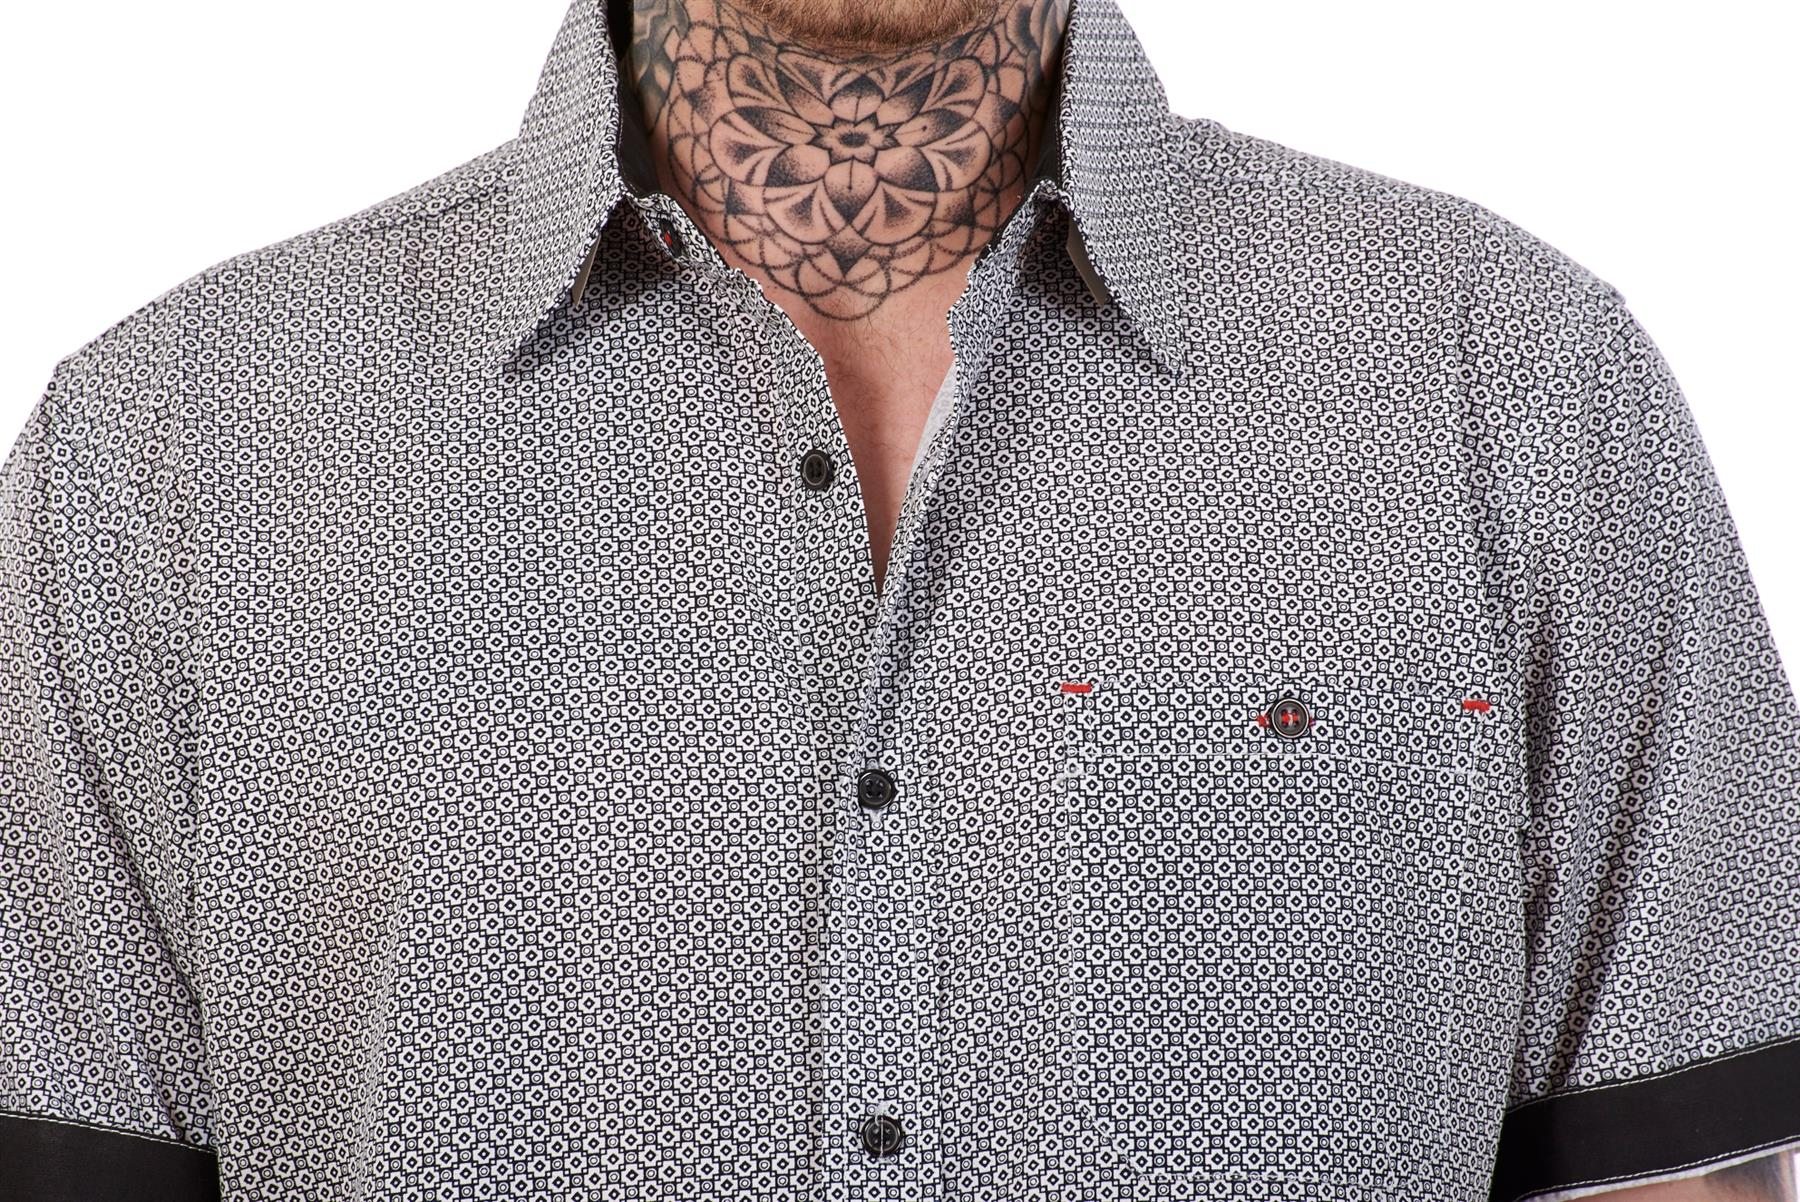 Mens-100-Cotton-Printed-Shirt-Short-Sleeve-Regular-Big-Size-Casual-Top-M-to-5XL thumbnail 11